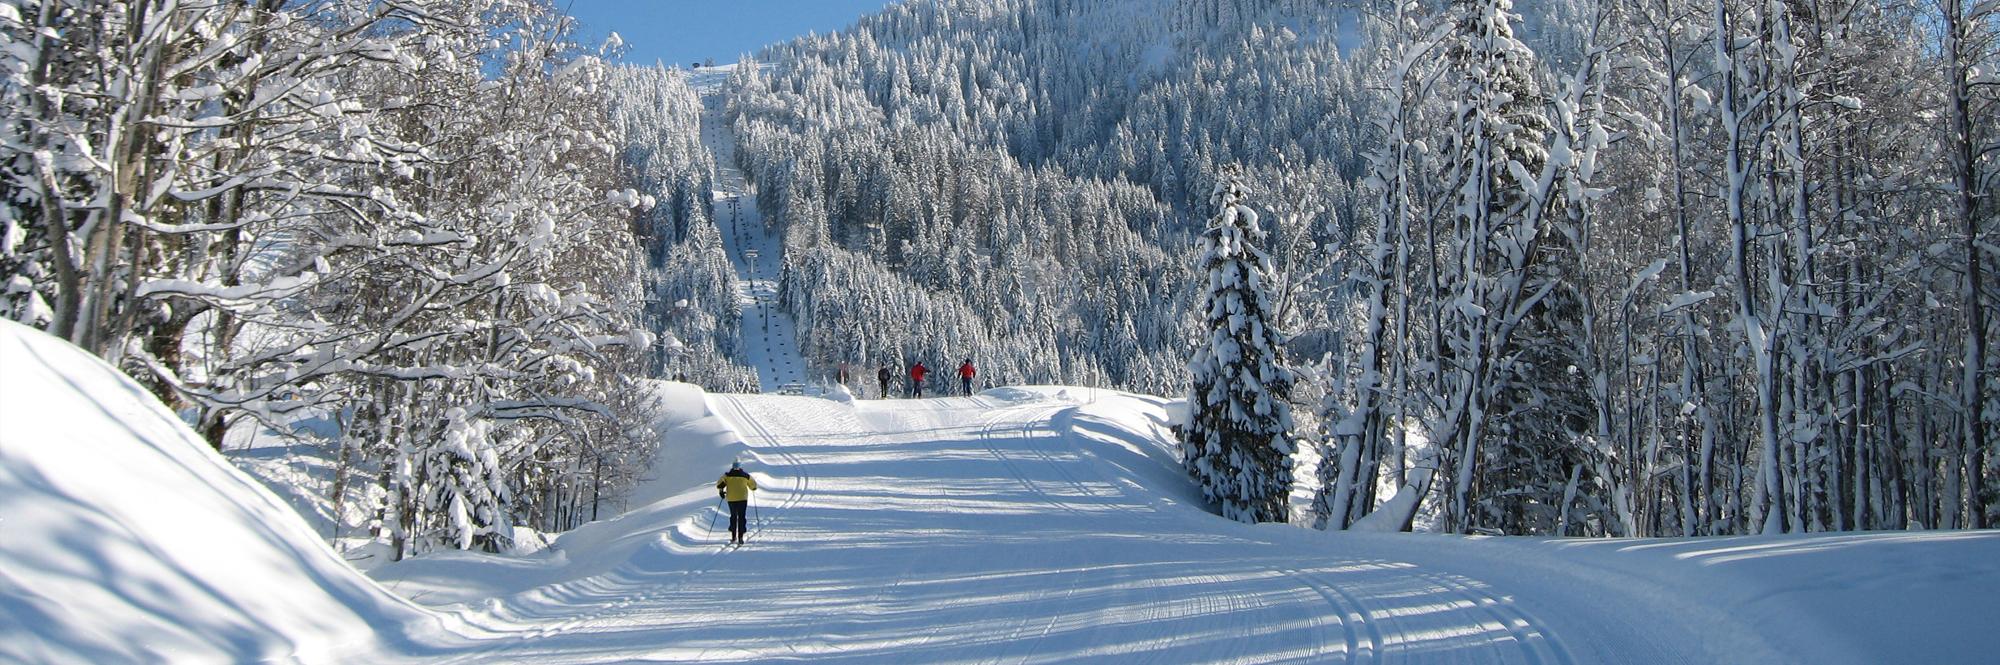 Winter im Allgäu - AlpenLodge Allgäu